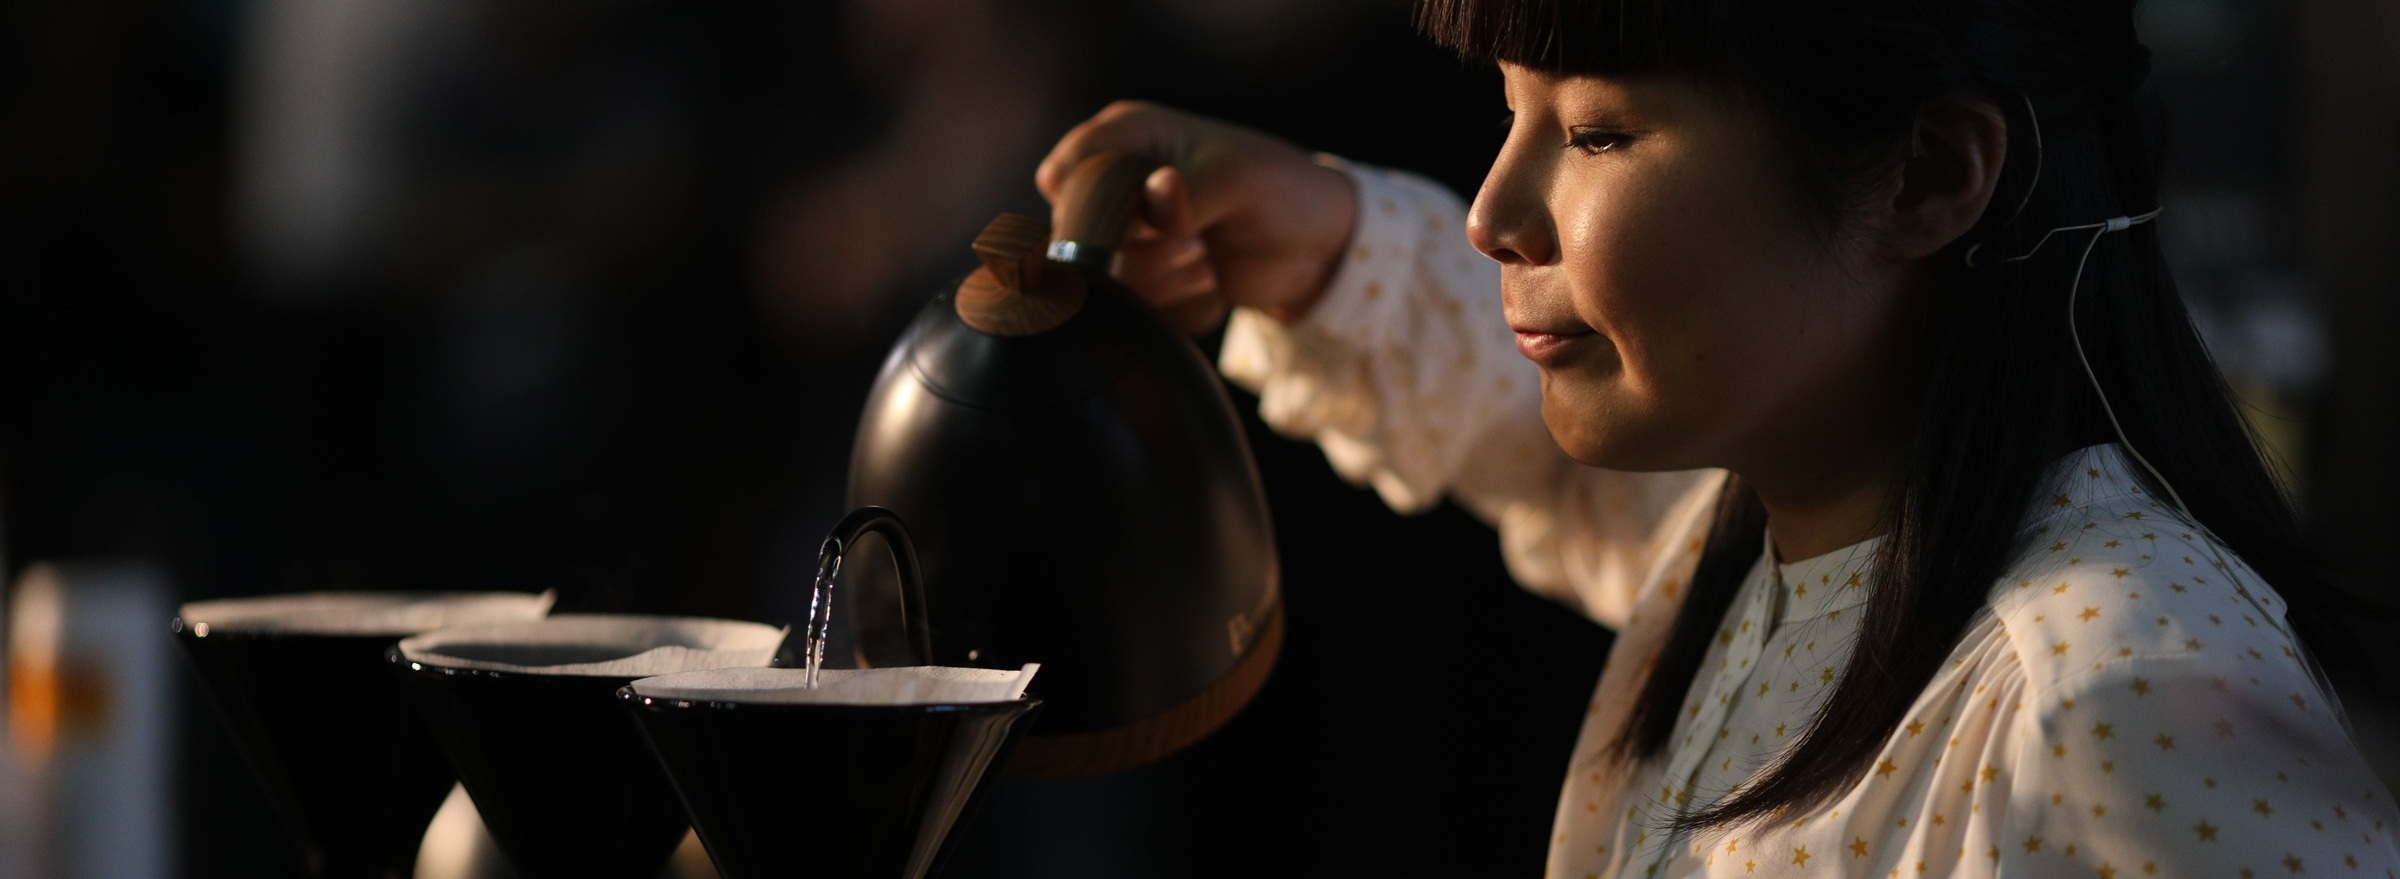 Emi Fukahori, World Brewers Cup Champion 2018